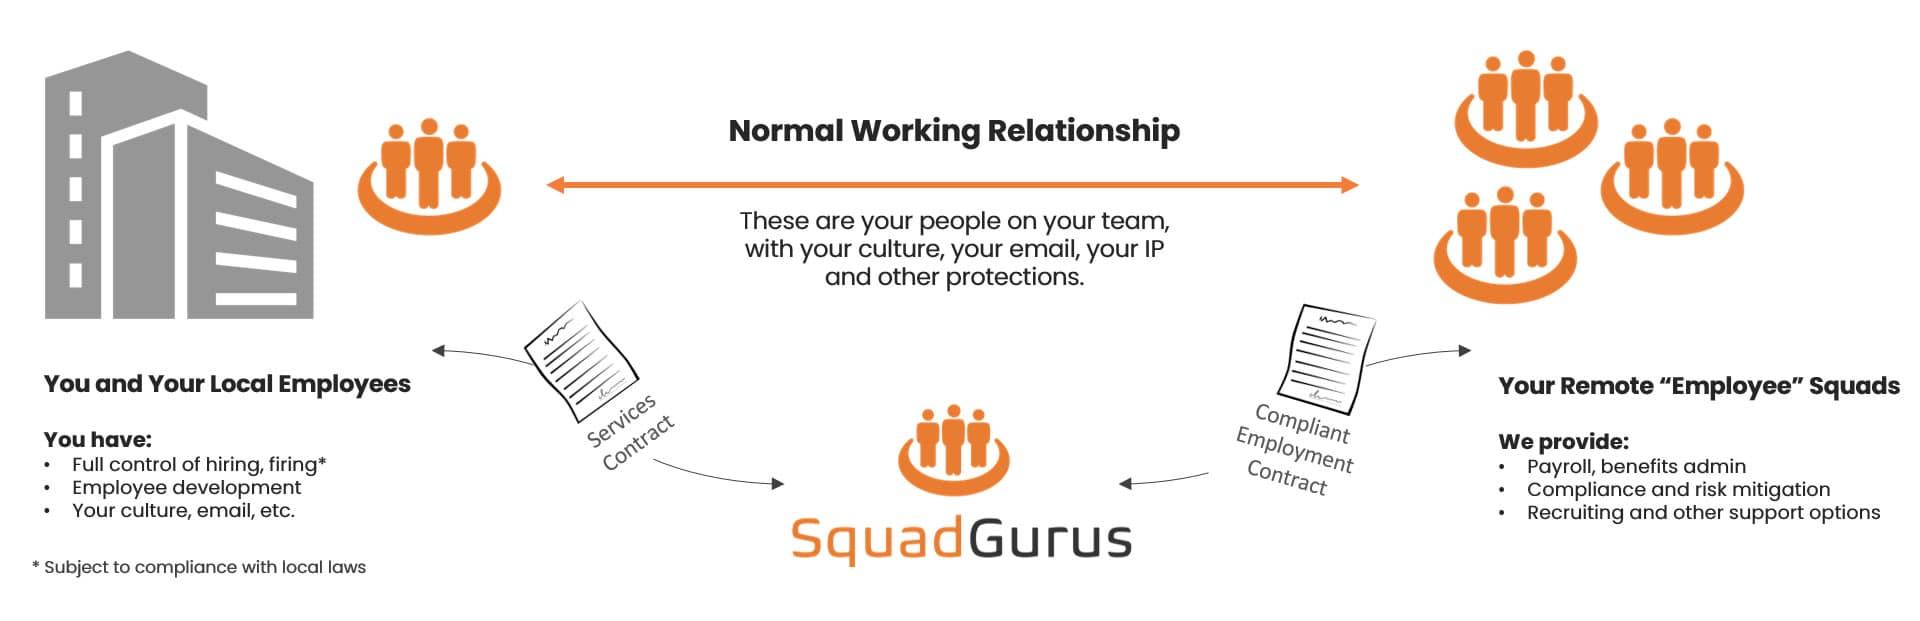 squad-gurus-peo-professional-employer-organization-b